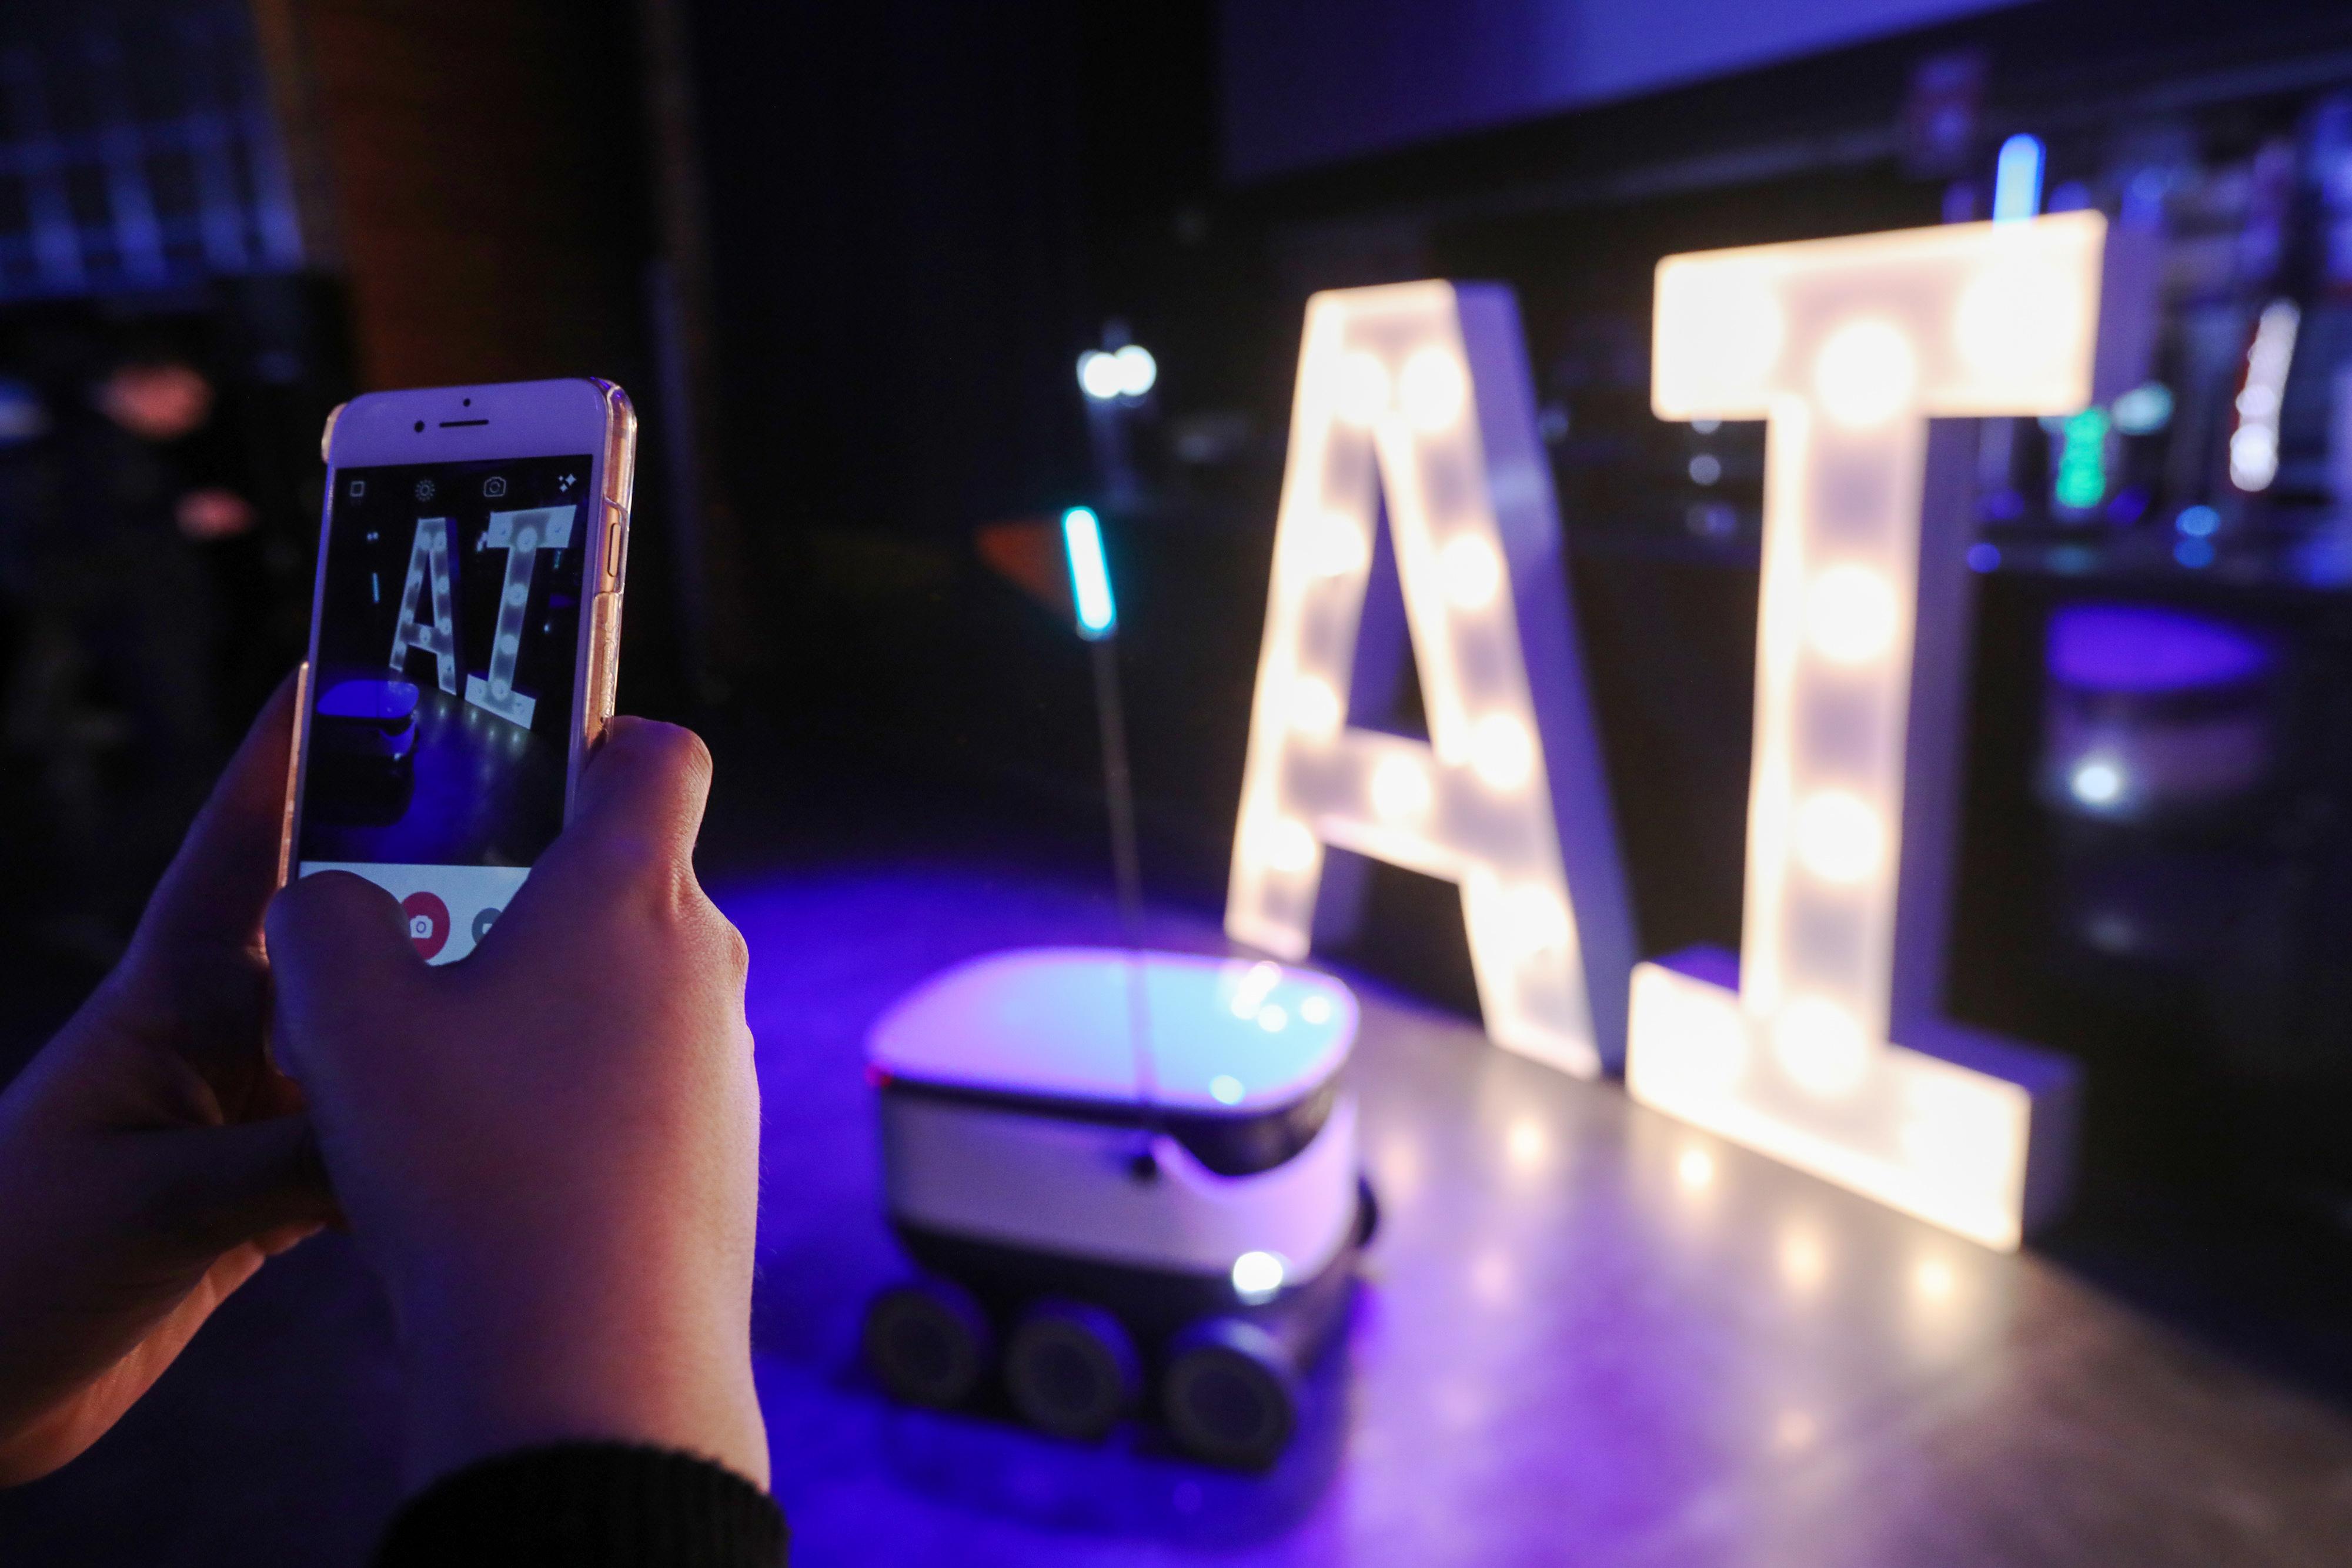 https://assets.sourcemedia.com/6a/10/7cea0ec24d09a4ca75430f3ac5c2/artificialintelligence.AI.Bloomberg.jpg